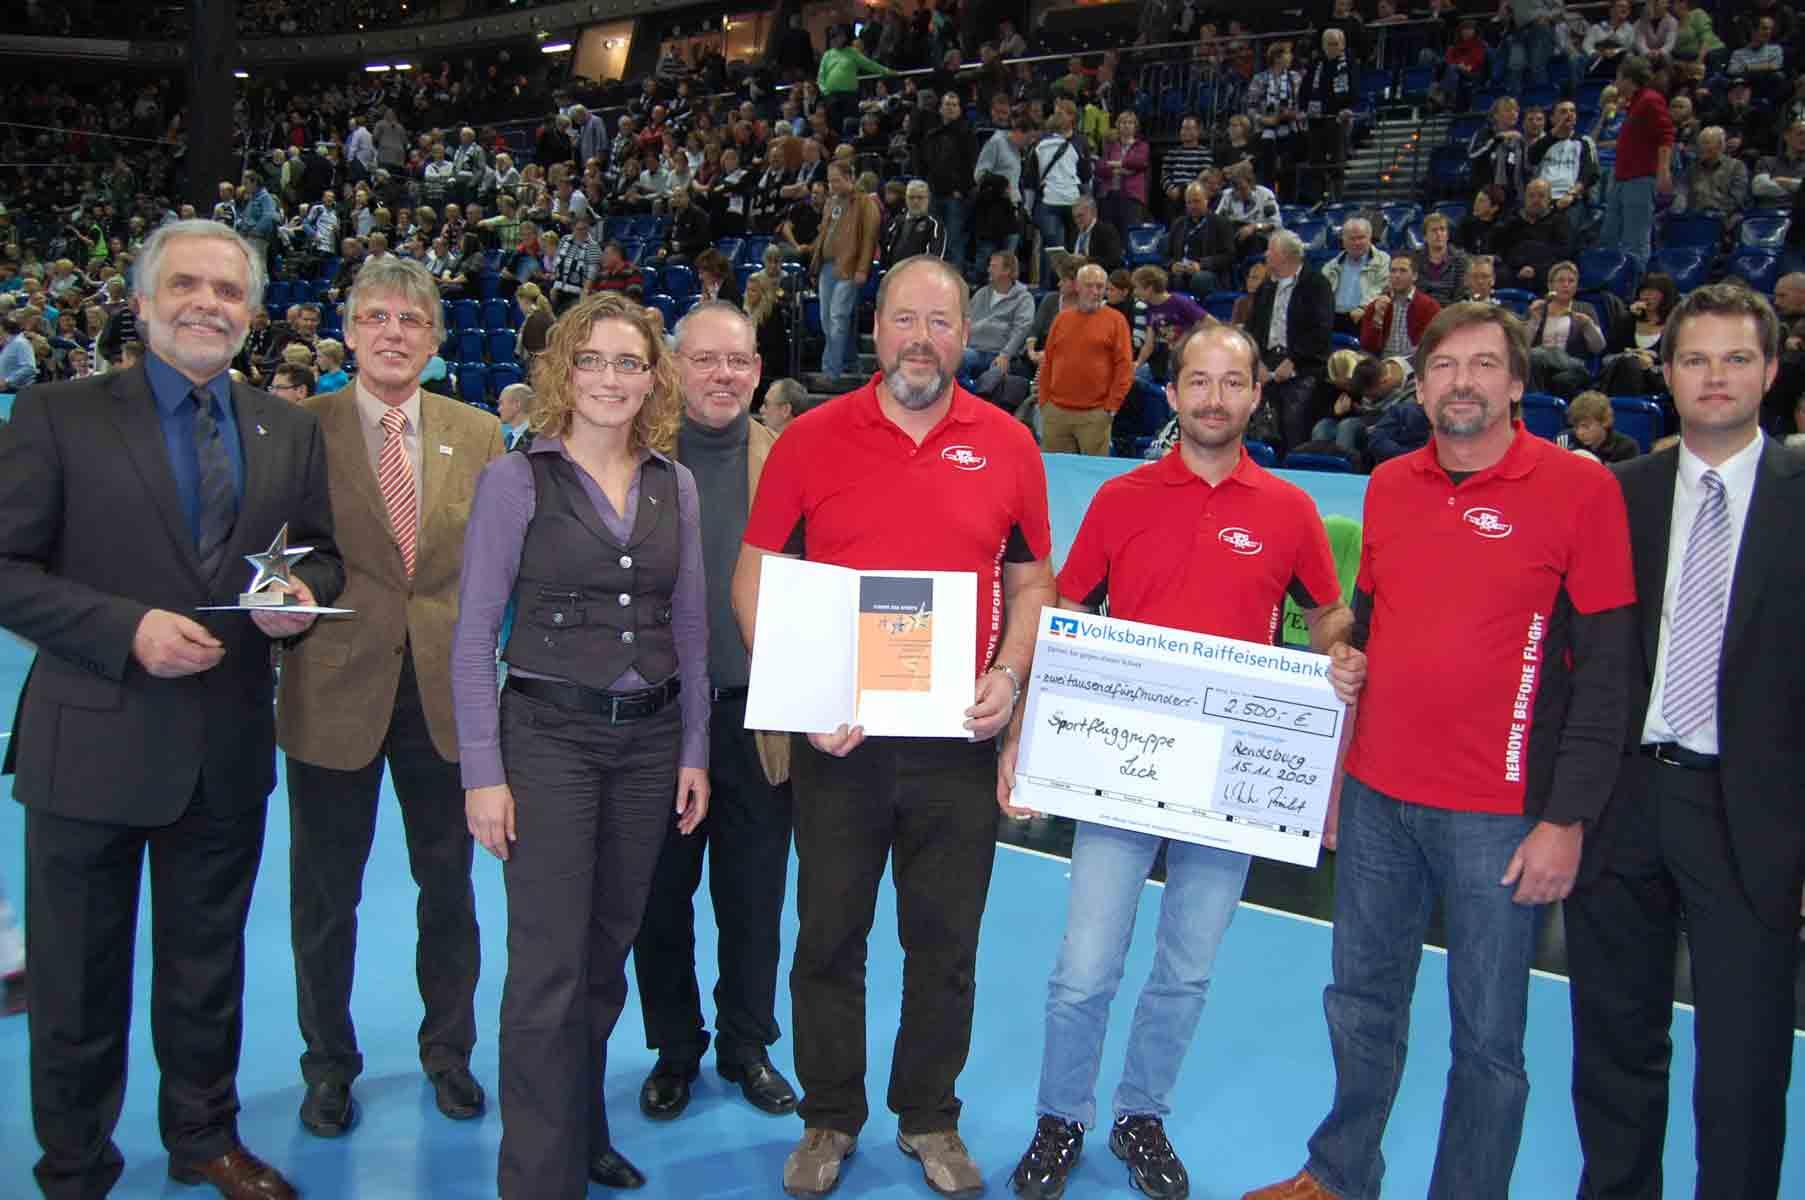 v.l.:Klaus Sievers (VR Bank Niebüll), Sönke-Peter Hansen (LSV), Tanja Bliesmann (VR Bank Niebüll), Hans-Jürgen Fröhlich (KSV), Harald Mikkelsen, Christian Scheel, Udo Peschel (alle Sportfluggruppe Leck), Sven Jensen (VR Bank Husum). (Quelle: VR Bank Husum)